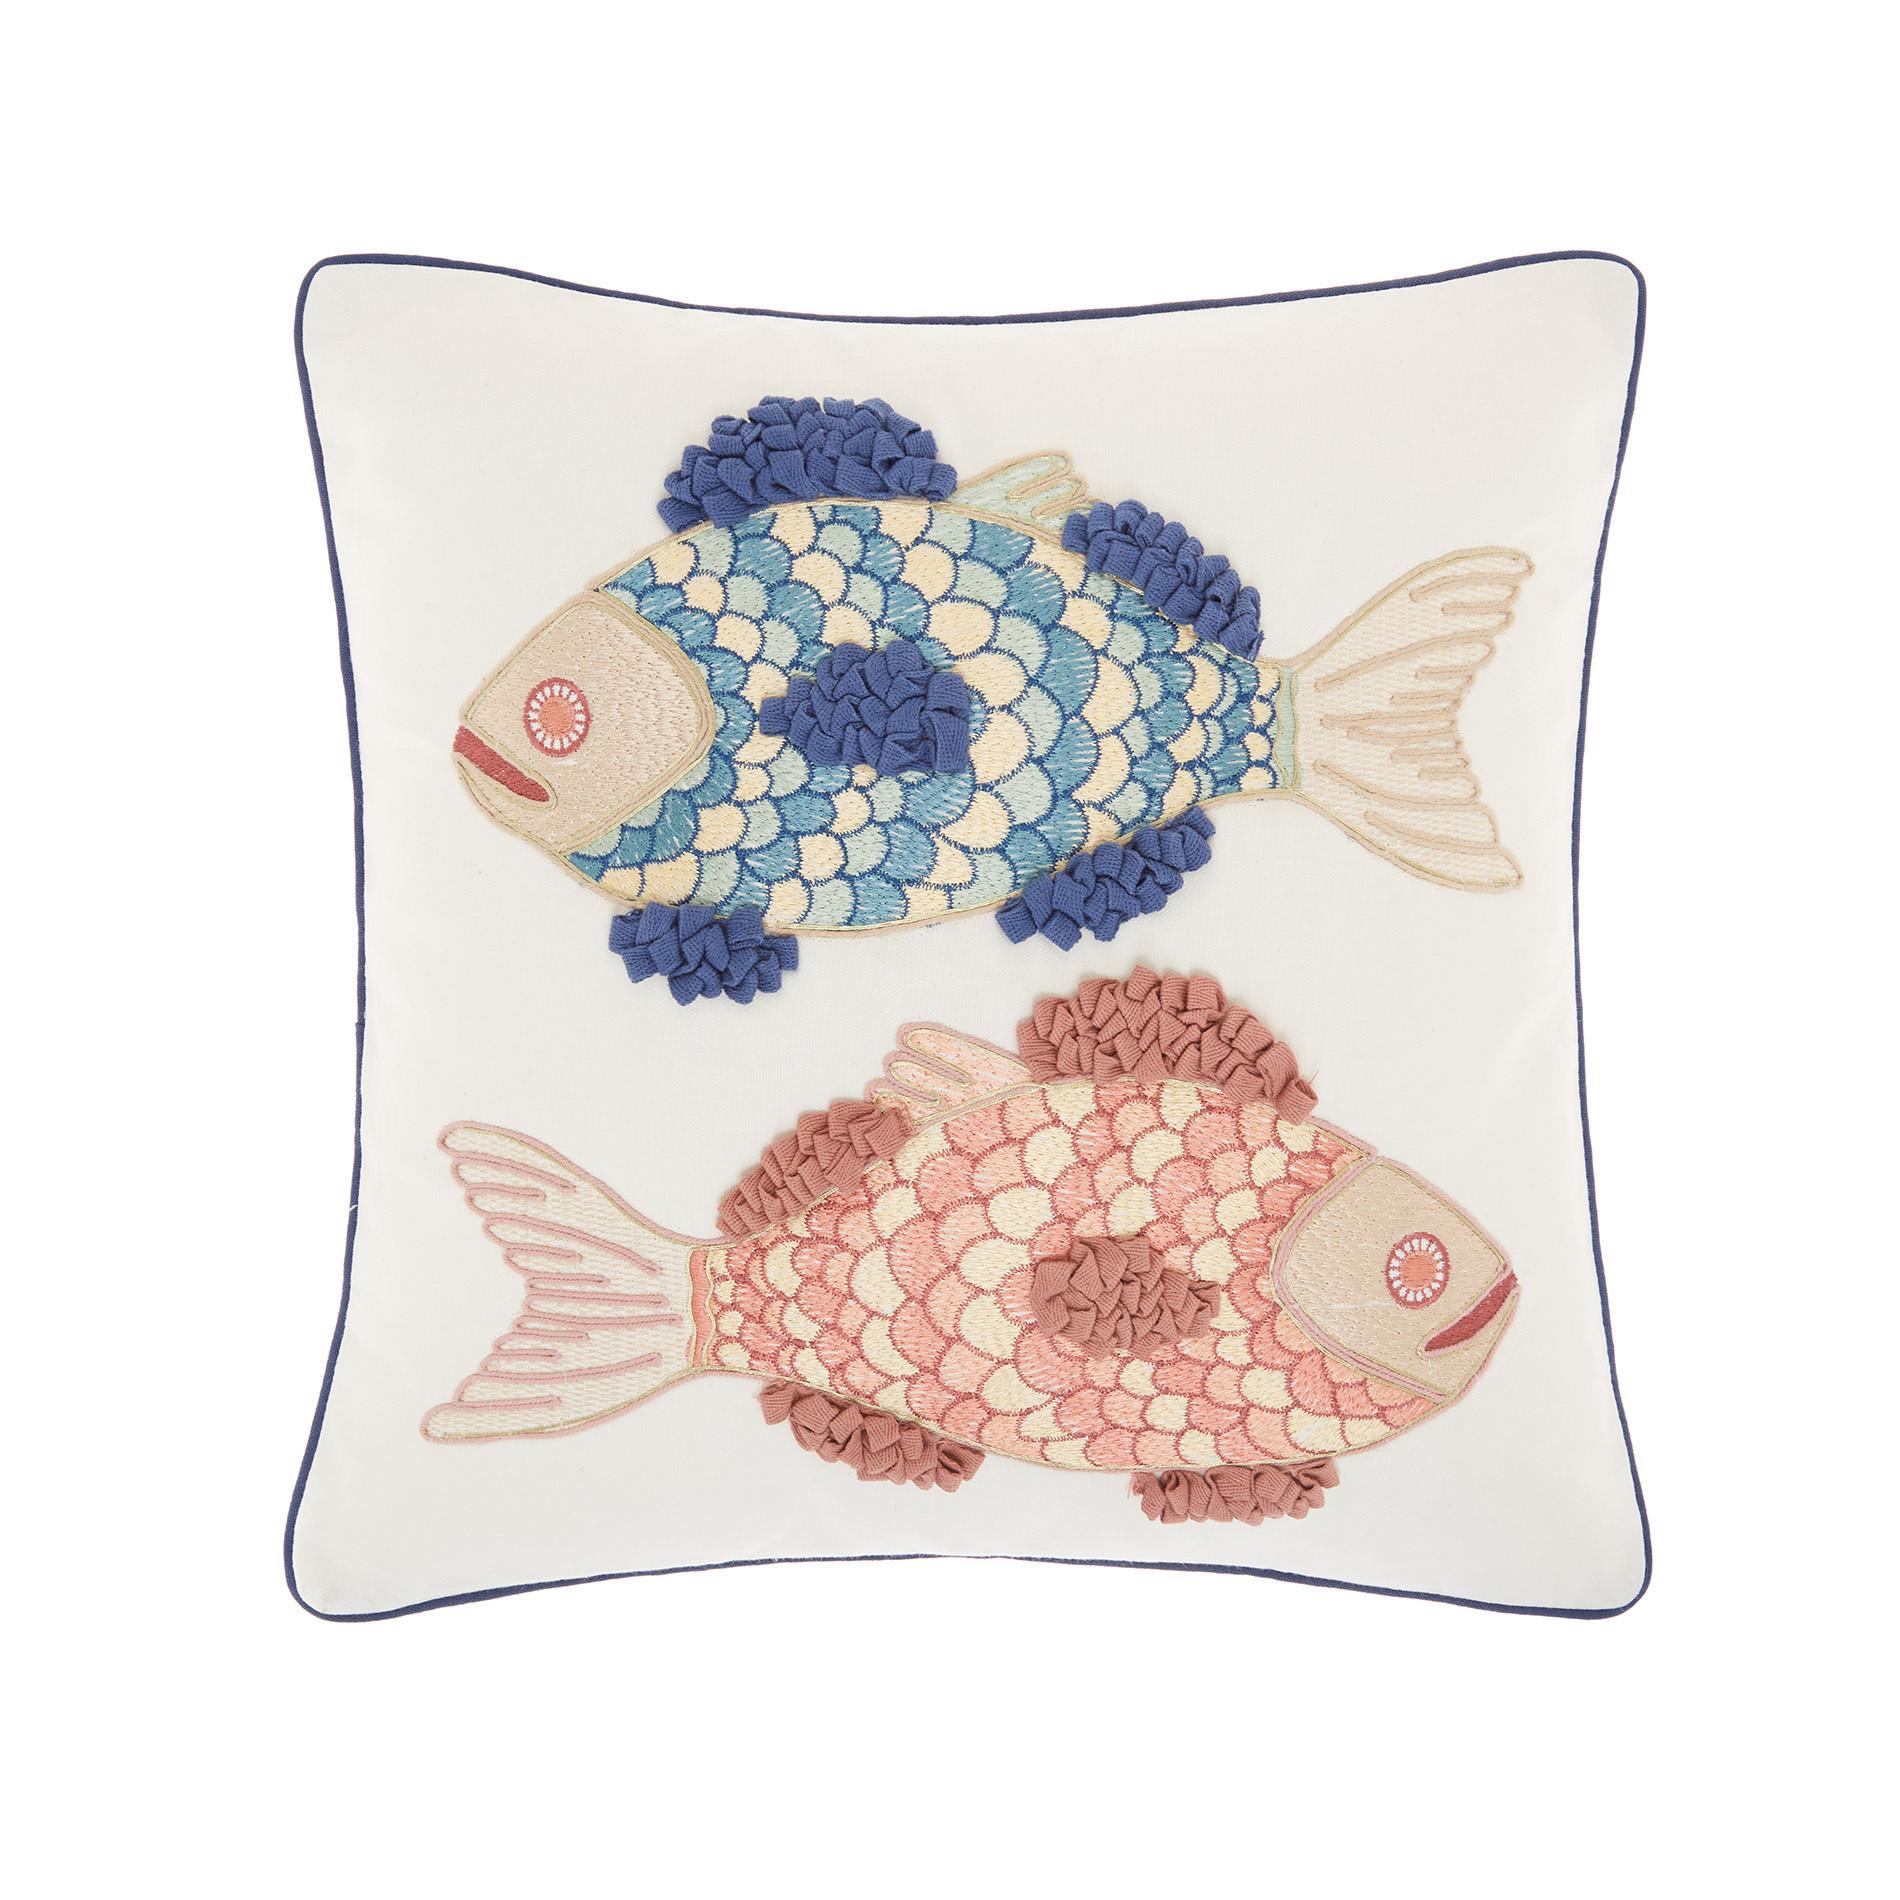 Cuscino ricamo pesci 45x45cm, Bianco, large image number 0